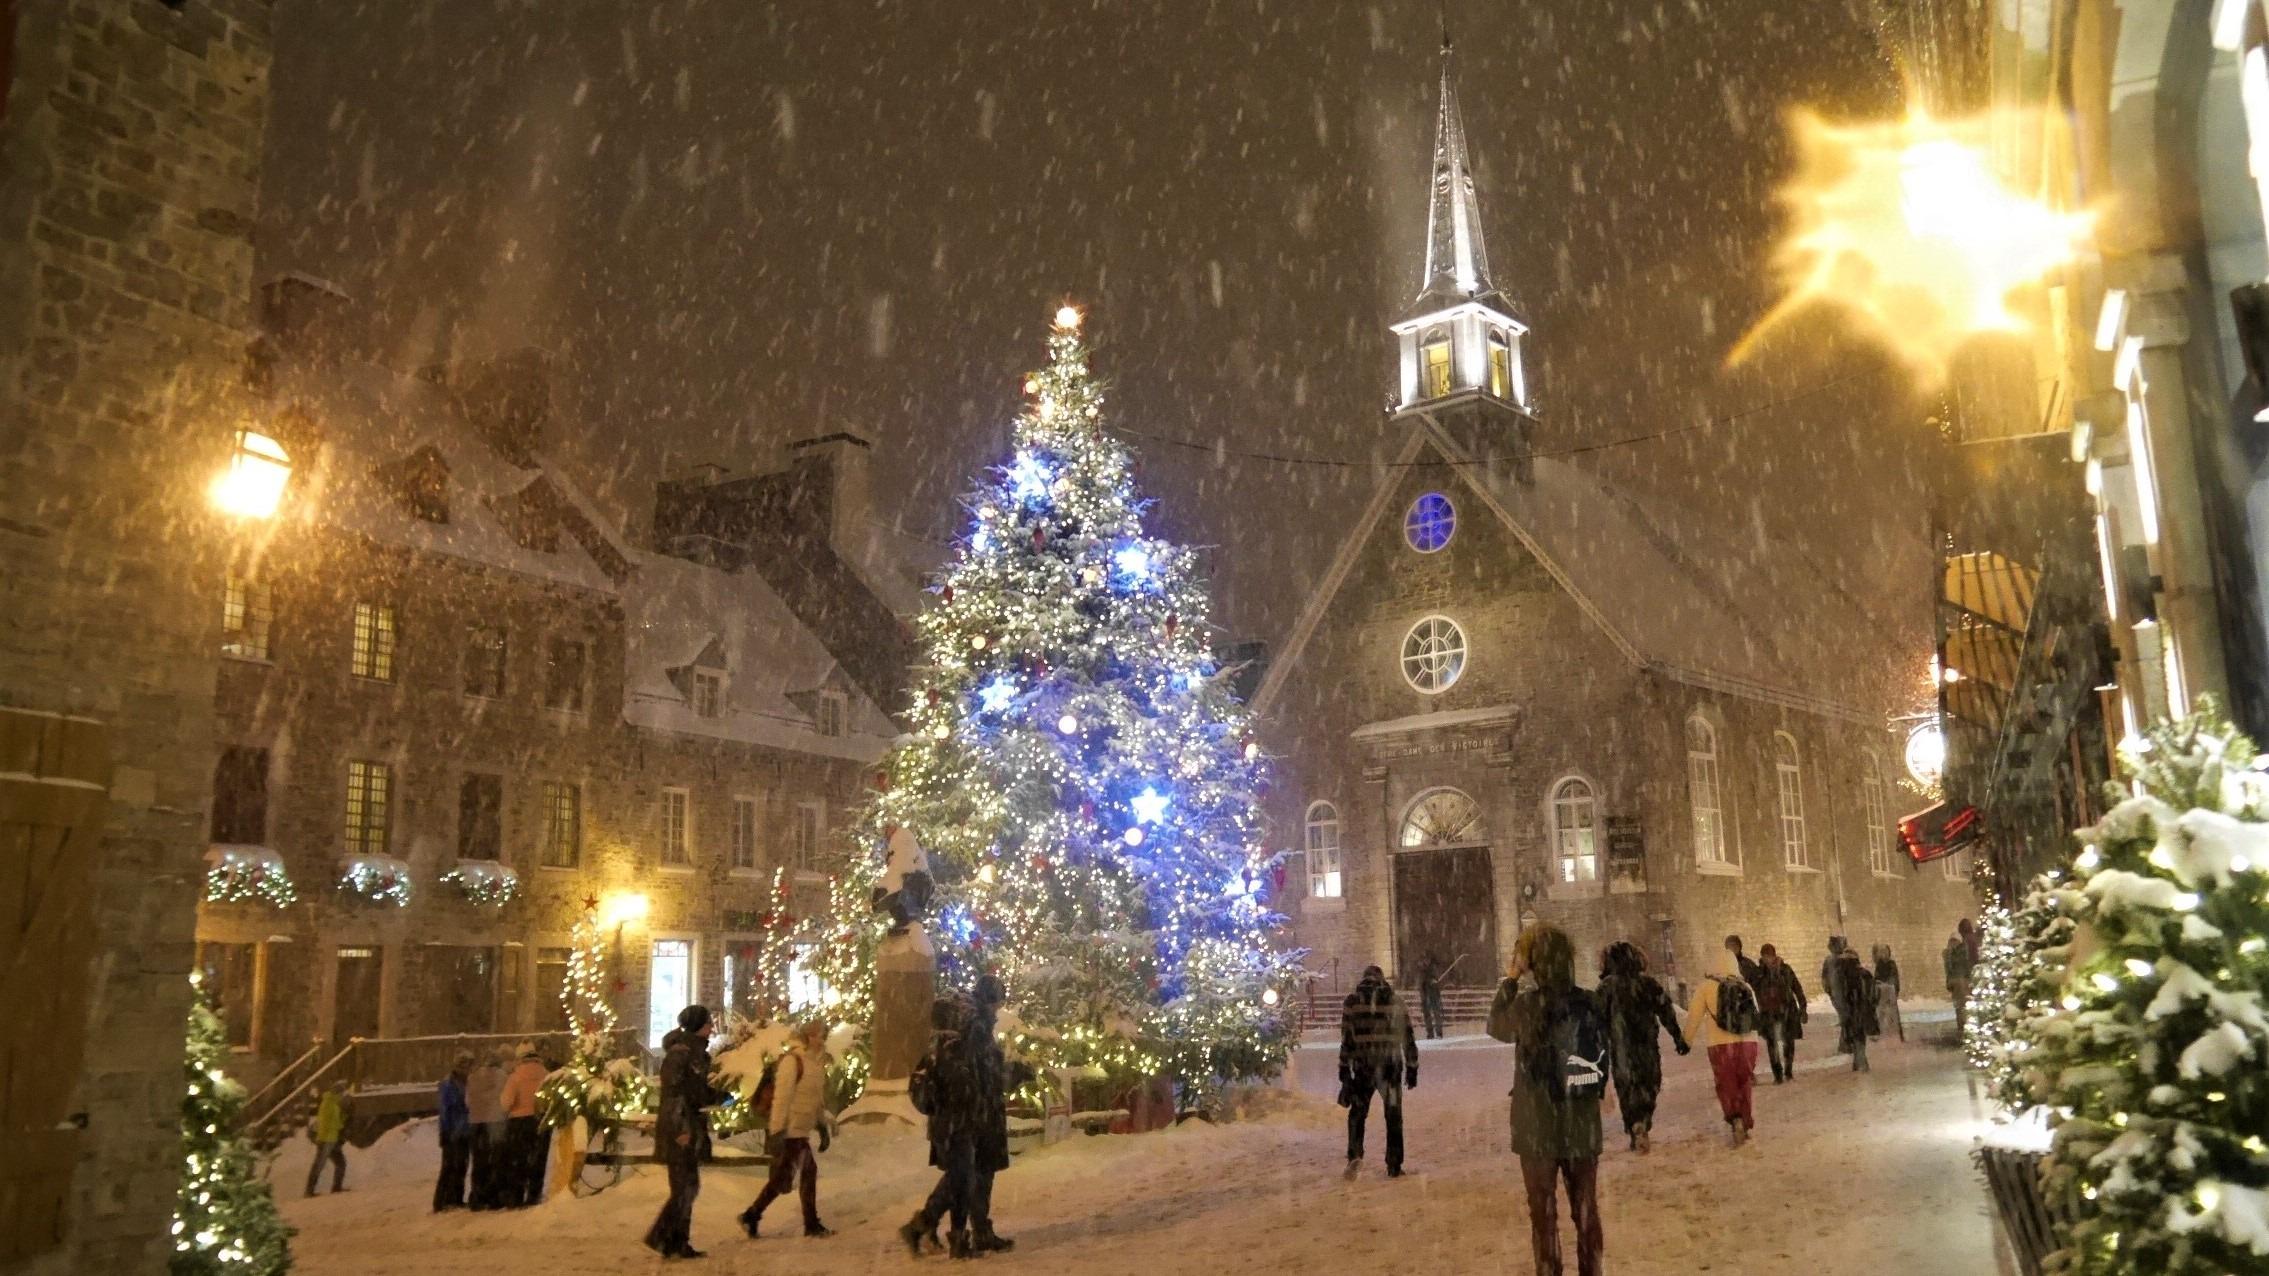 Quebec noel petit champlain decos illuminations fetes reveillon blog voyage canada hiver arpenter le chemin